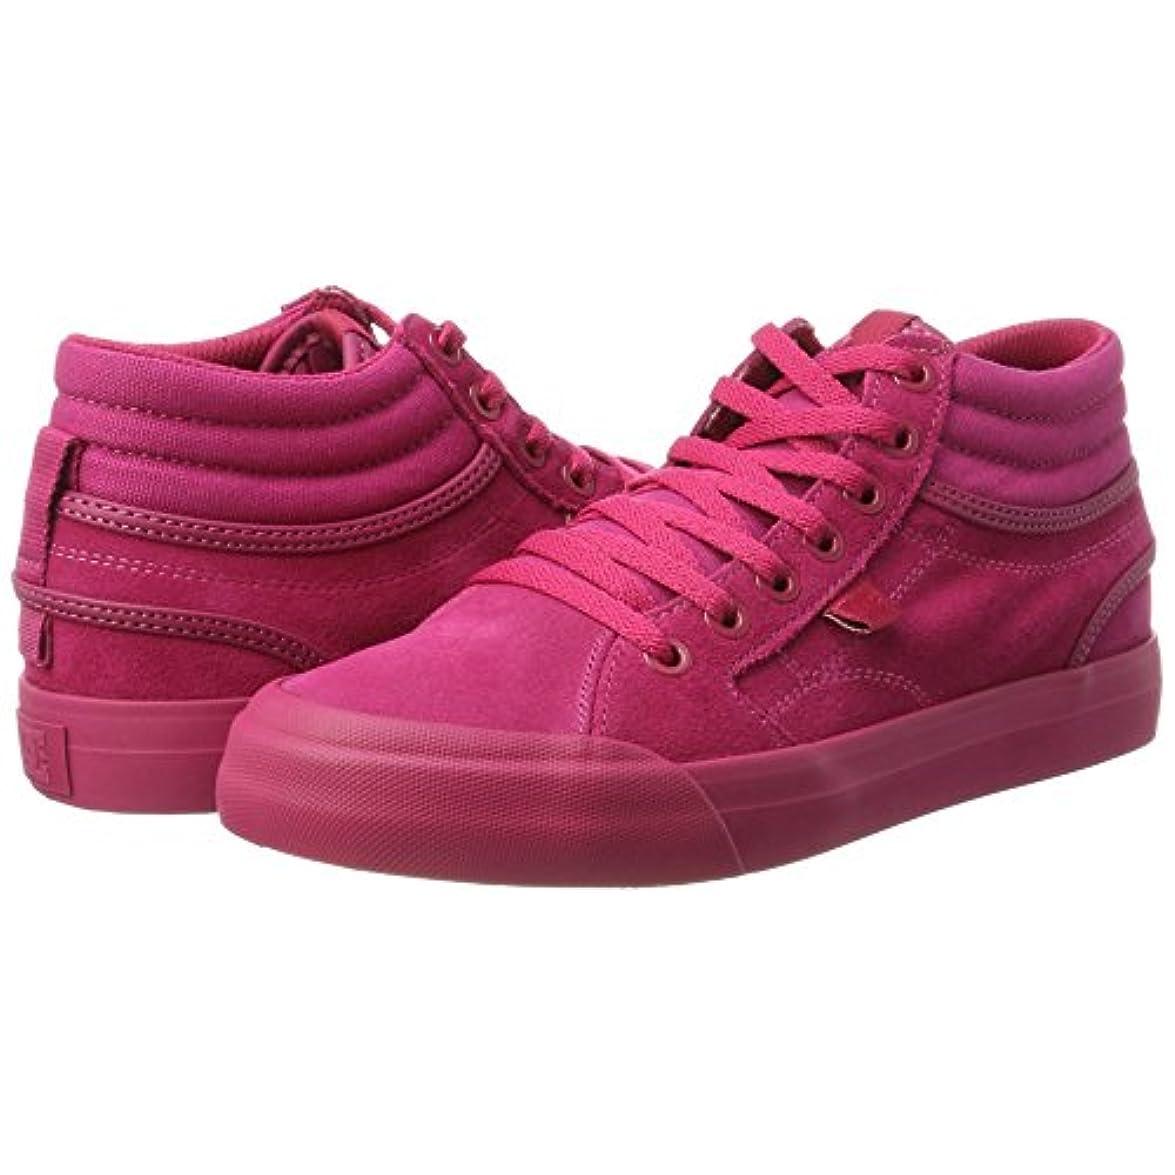 Dc Shoes Evan Hi Se Scarpe Da Ginnastica Basse Donna